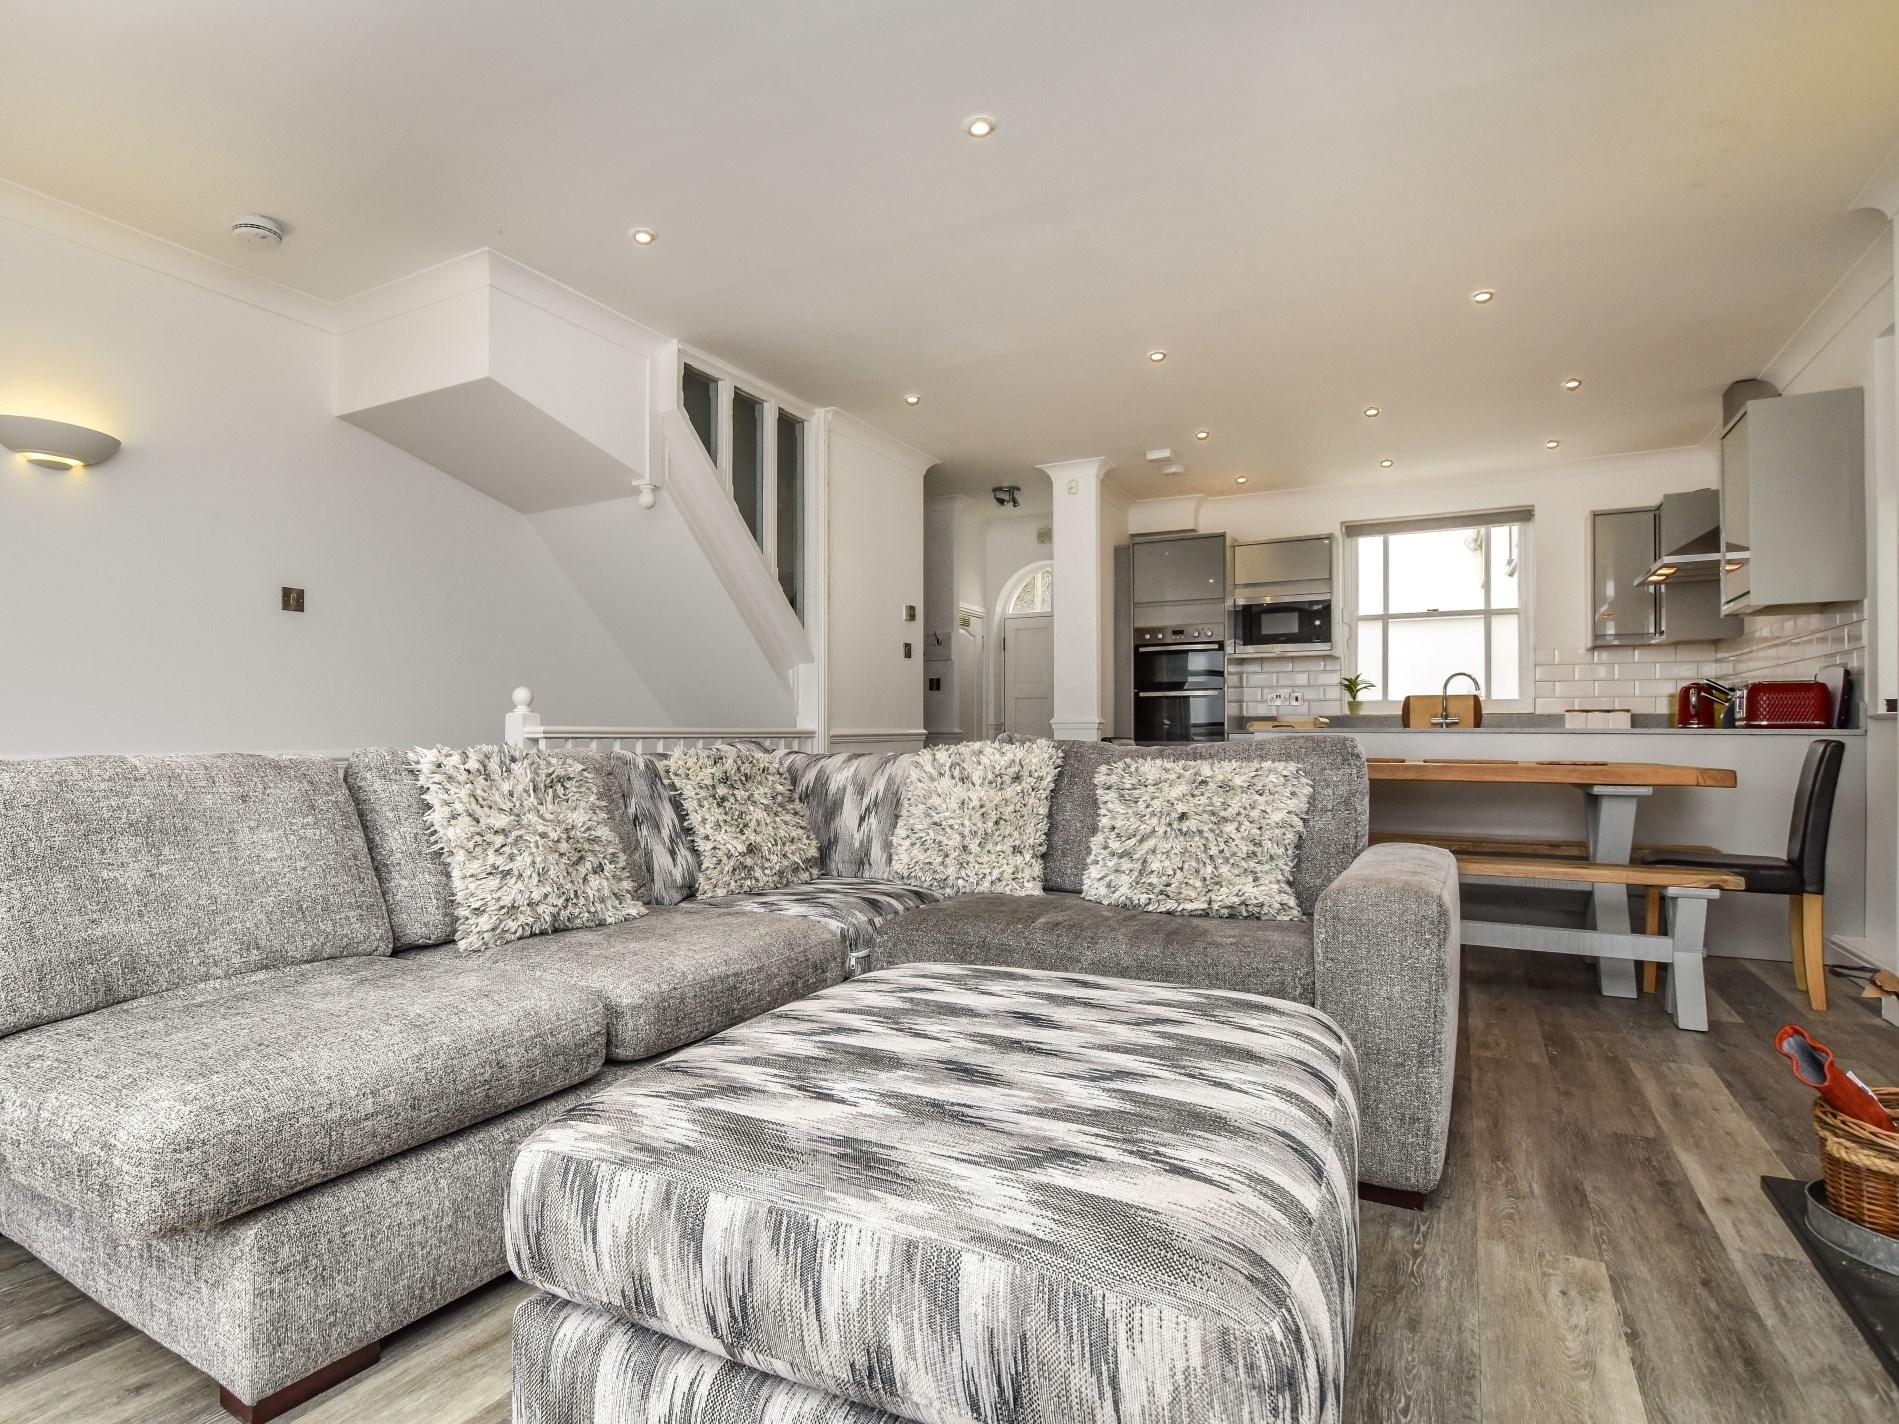 3 Bedroom House in North Devon, Devon